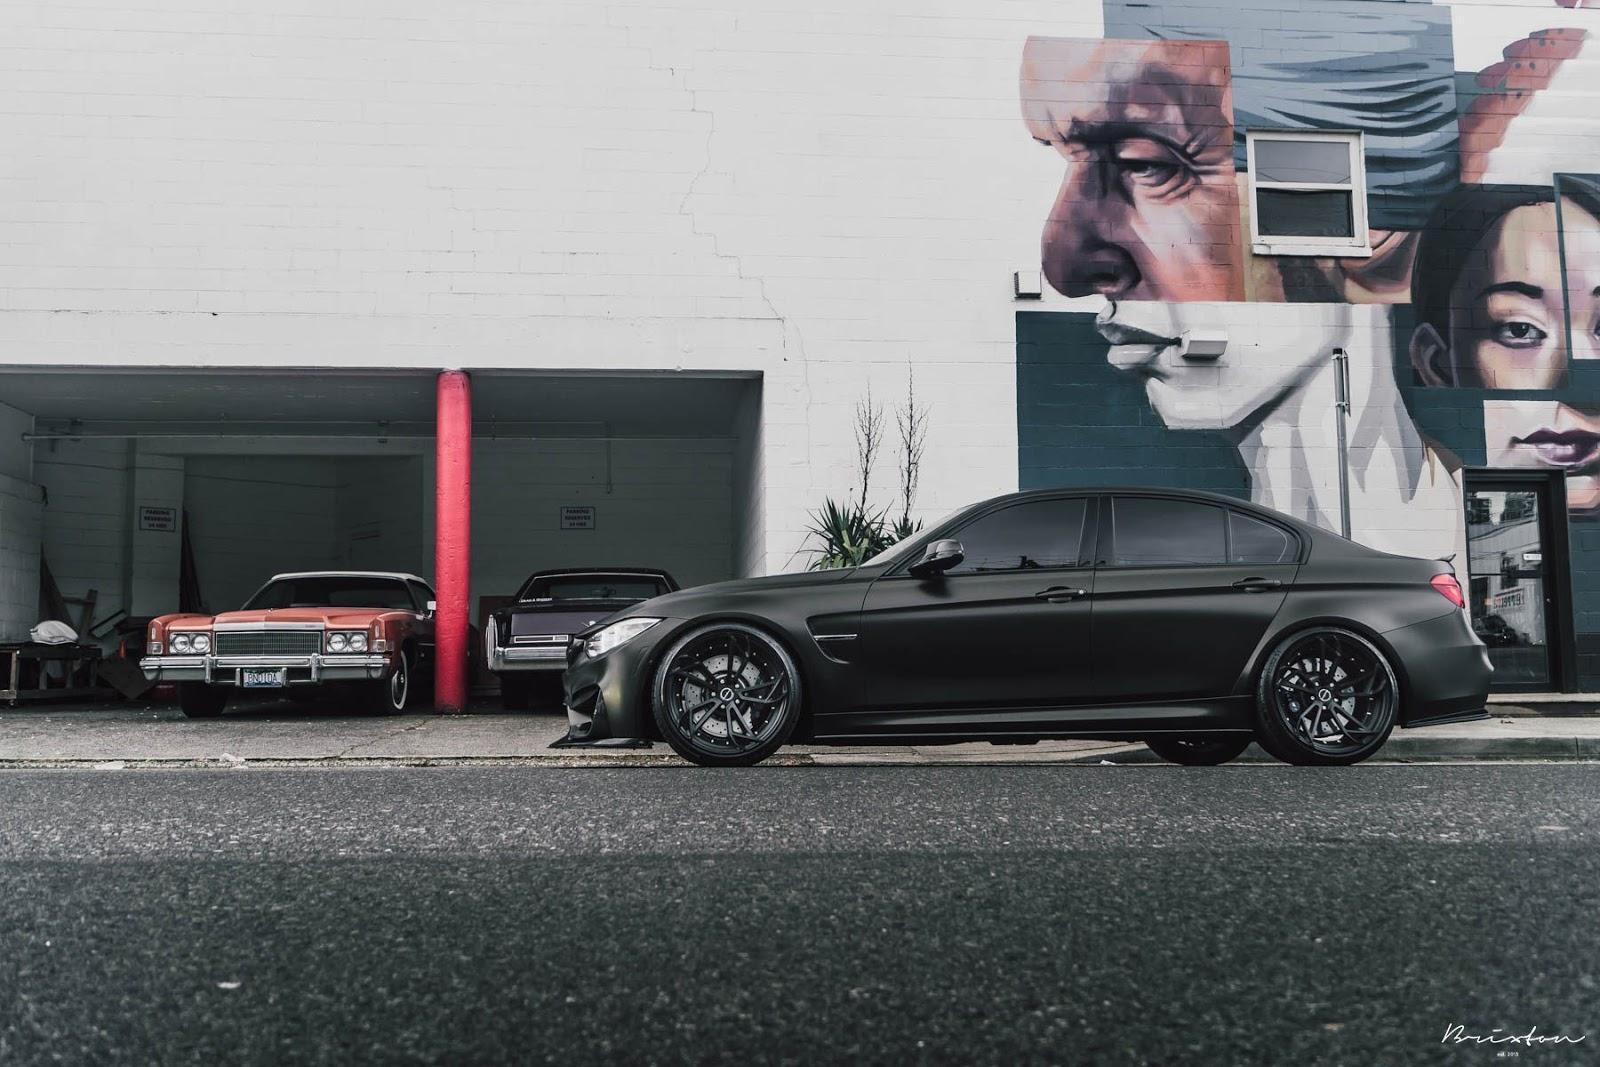 BMW M3 cu jante Brixton Forged - BMW M3 cu jante Brixton Forged